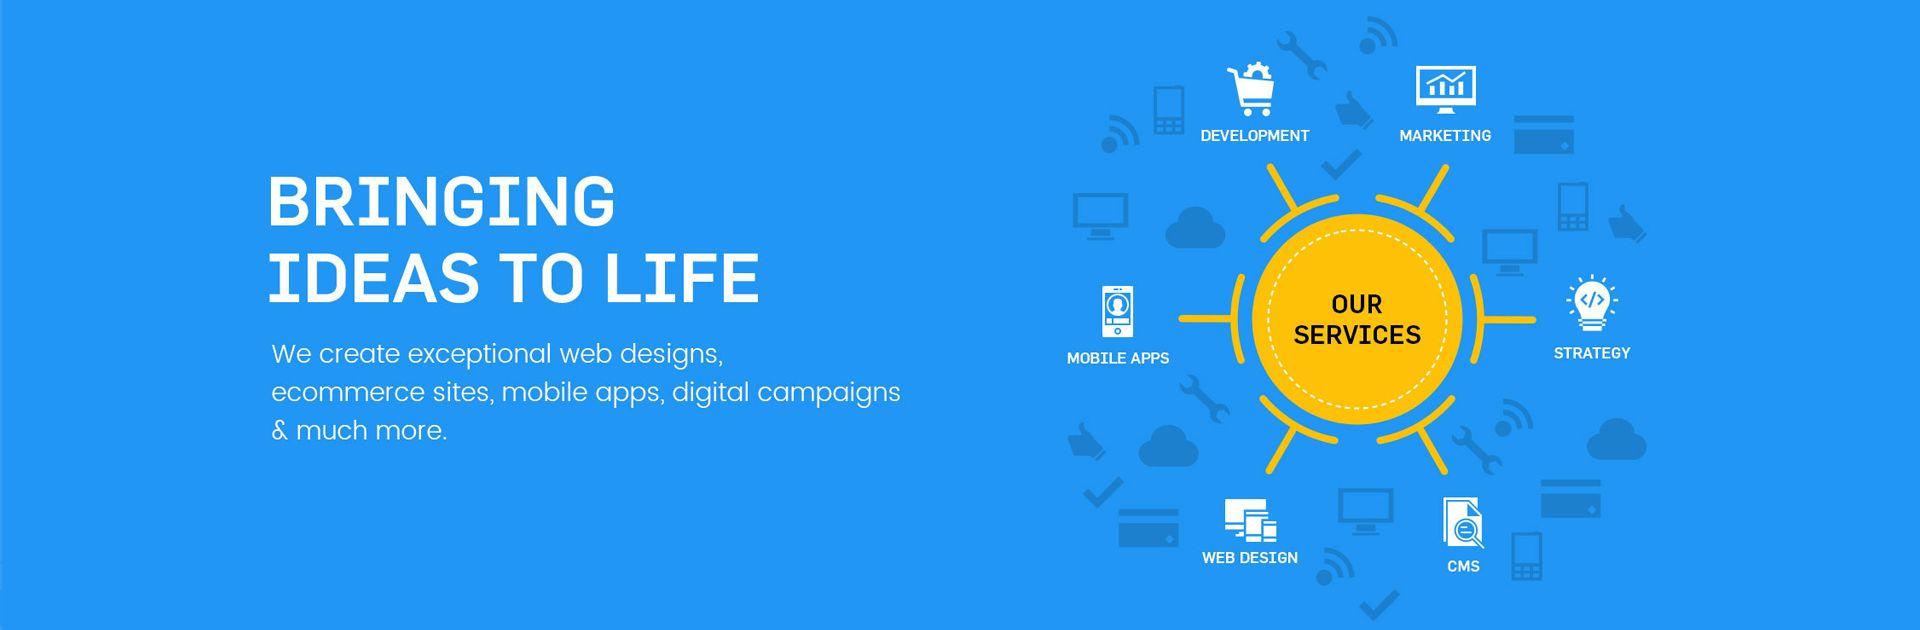 We Are Into Search Engine Optimization Seo Link Building Web Designing Web Development E Search Engine Optimization Seo Web Design Seo Service Provider